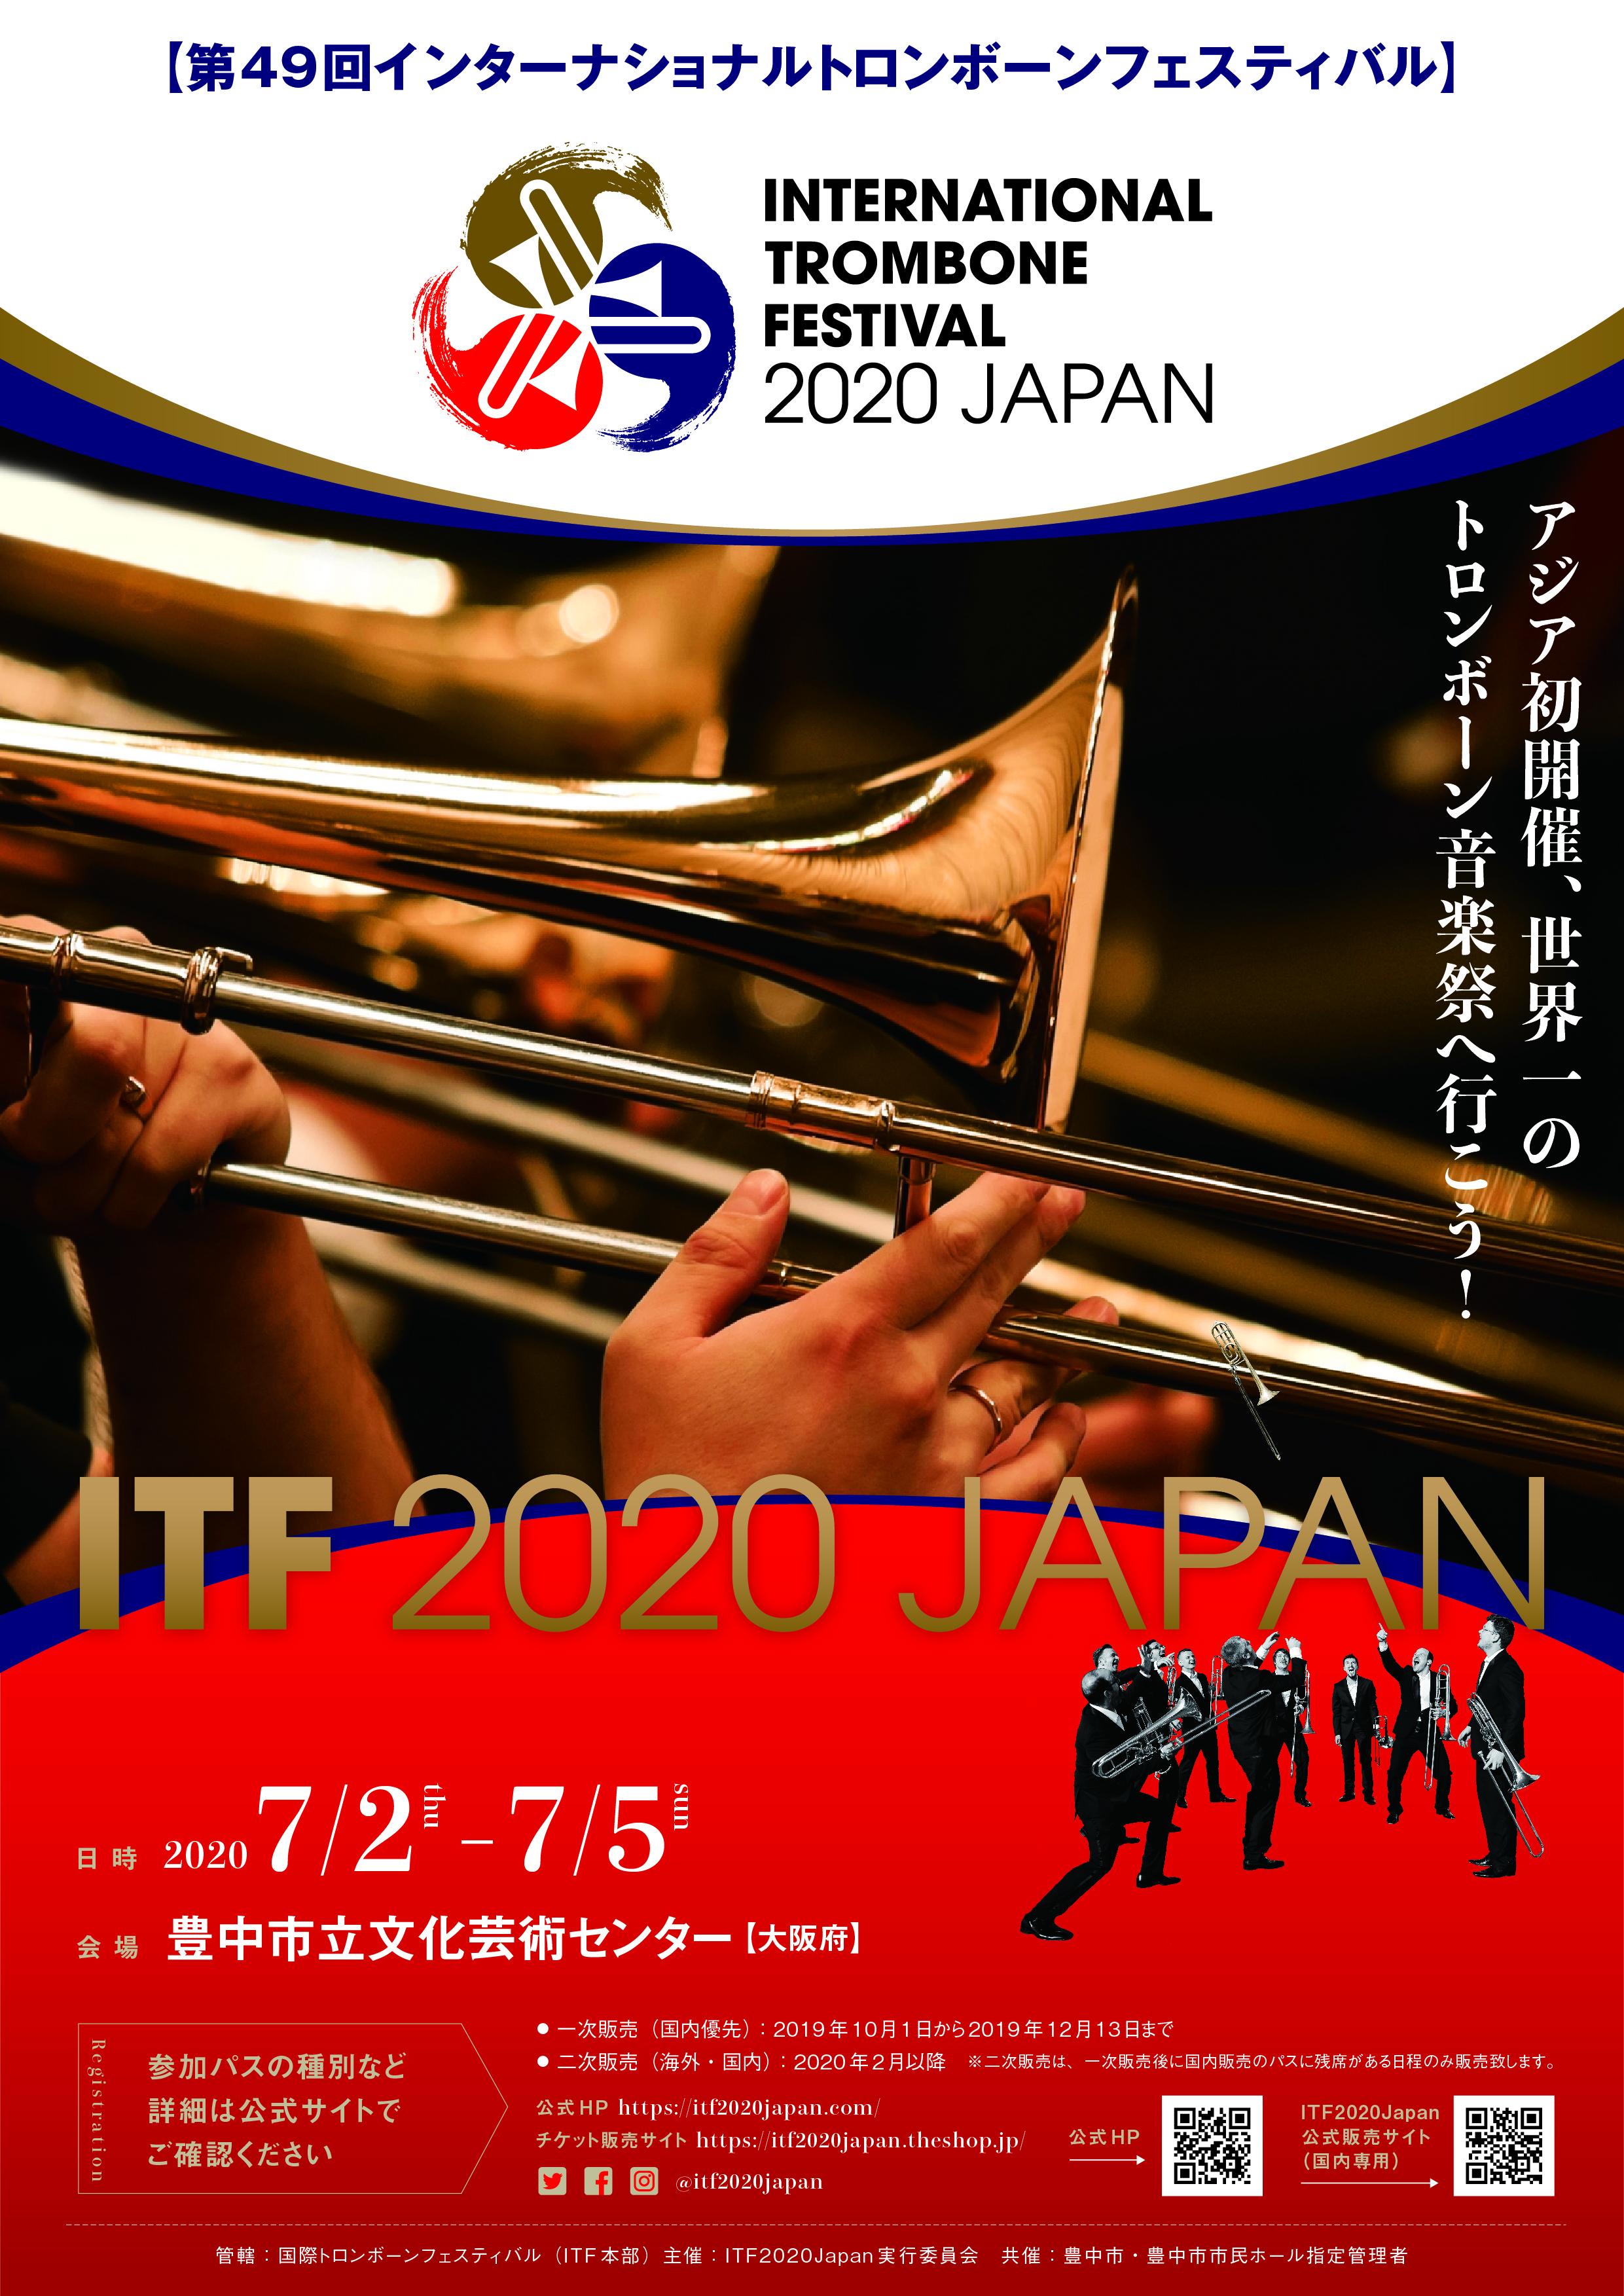 ITF2020Japan インターナショナルトロンボーンフェスティバルチラシ表